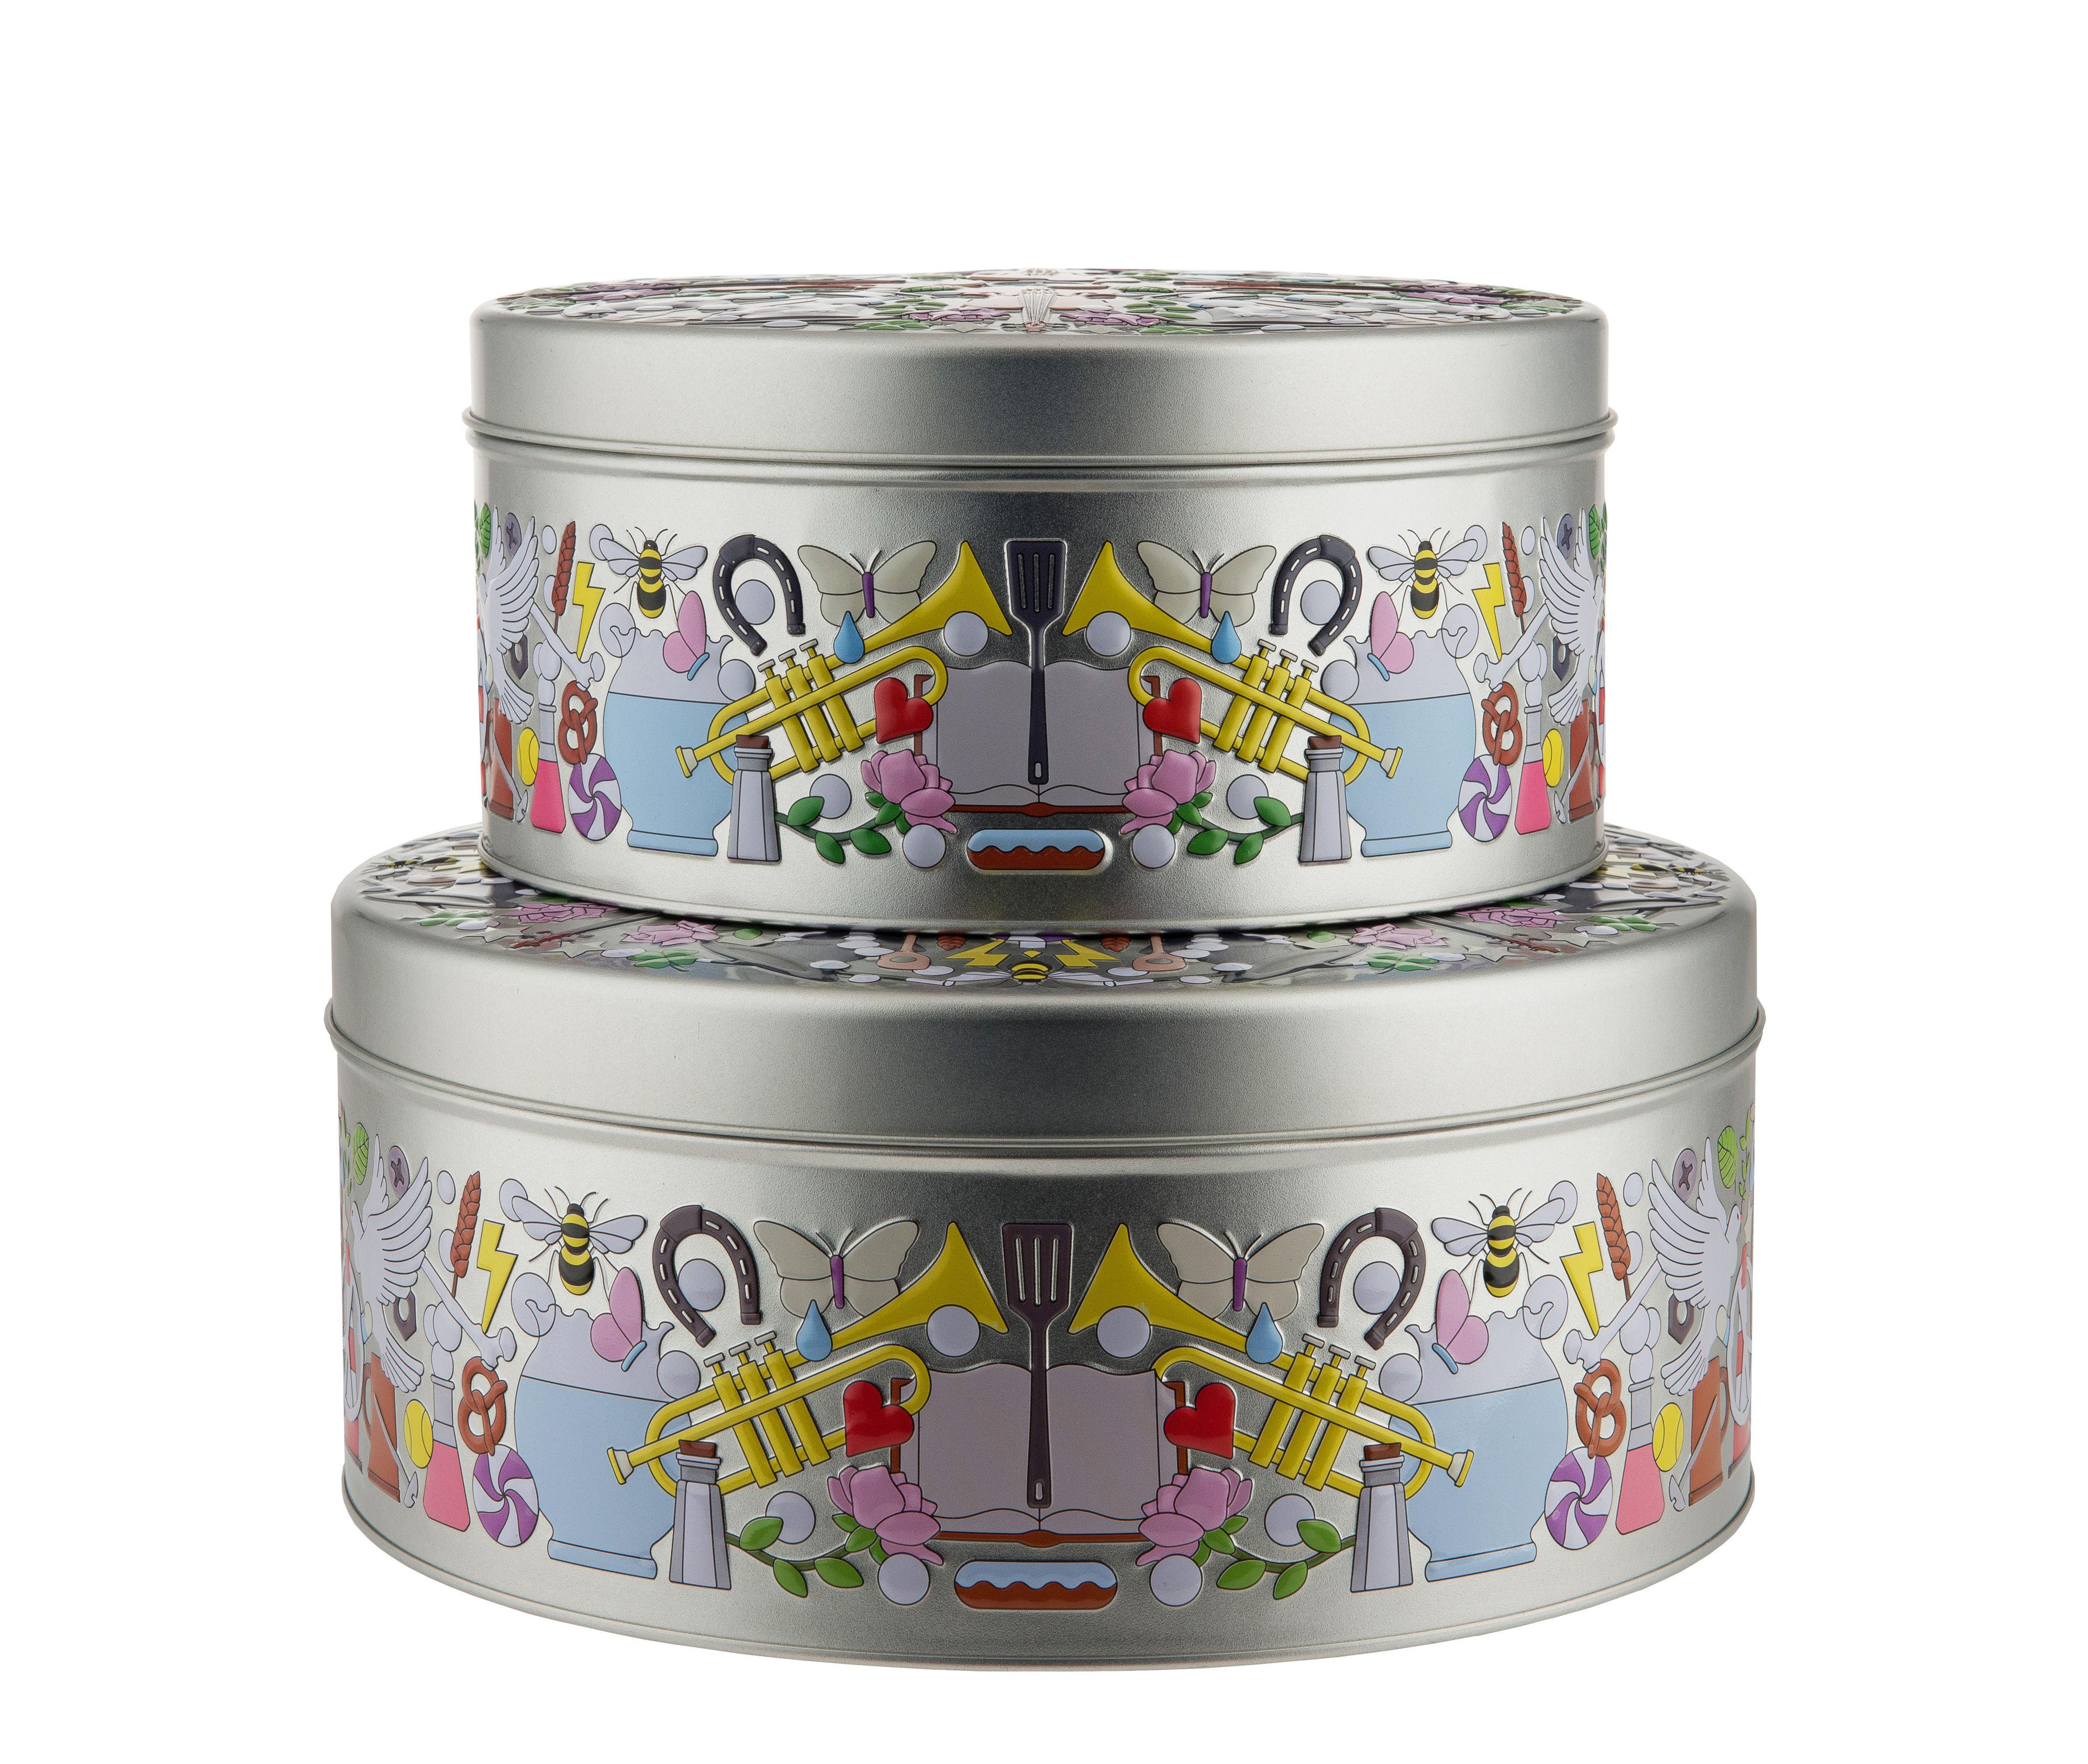 Kitchenware - Kitchen Storage Jars - Garybaldi Tin Box - / Set of 2 - Metal by Alessi - Multicoloured - Painted tinplate